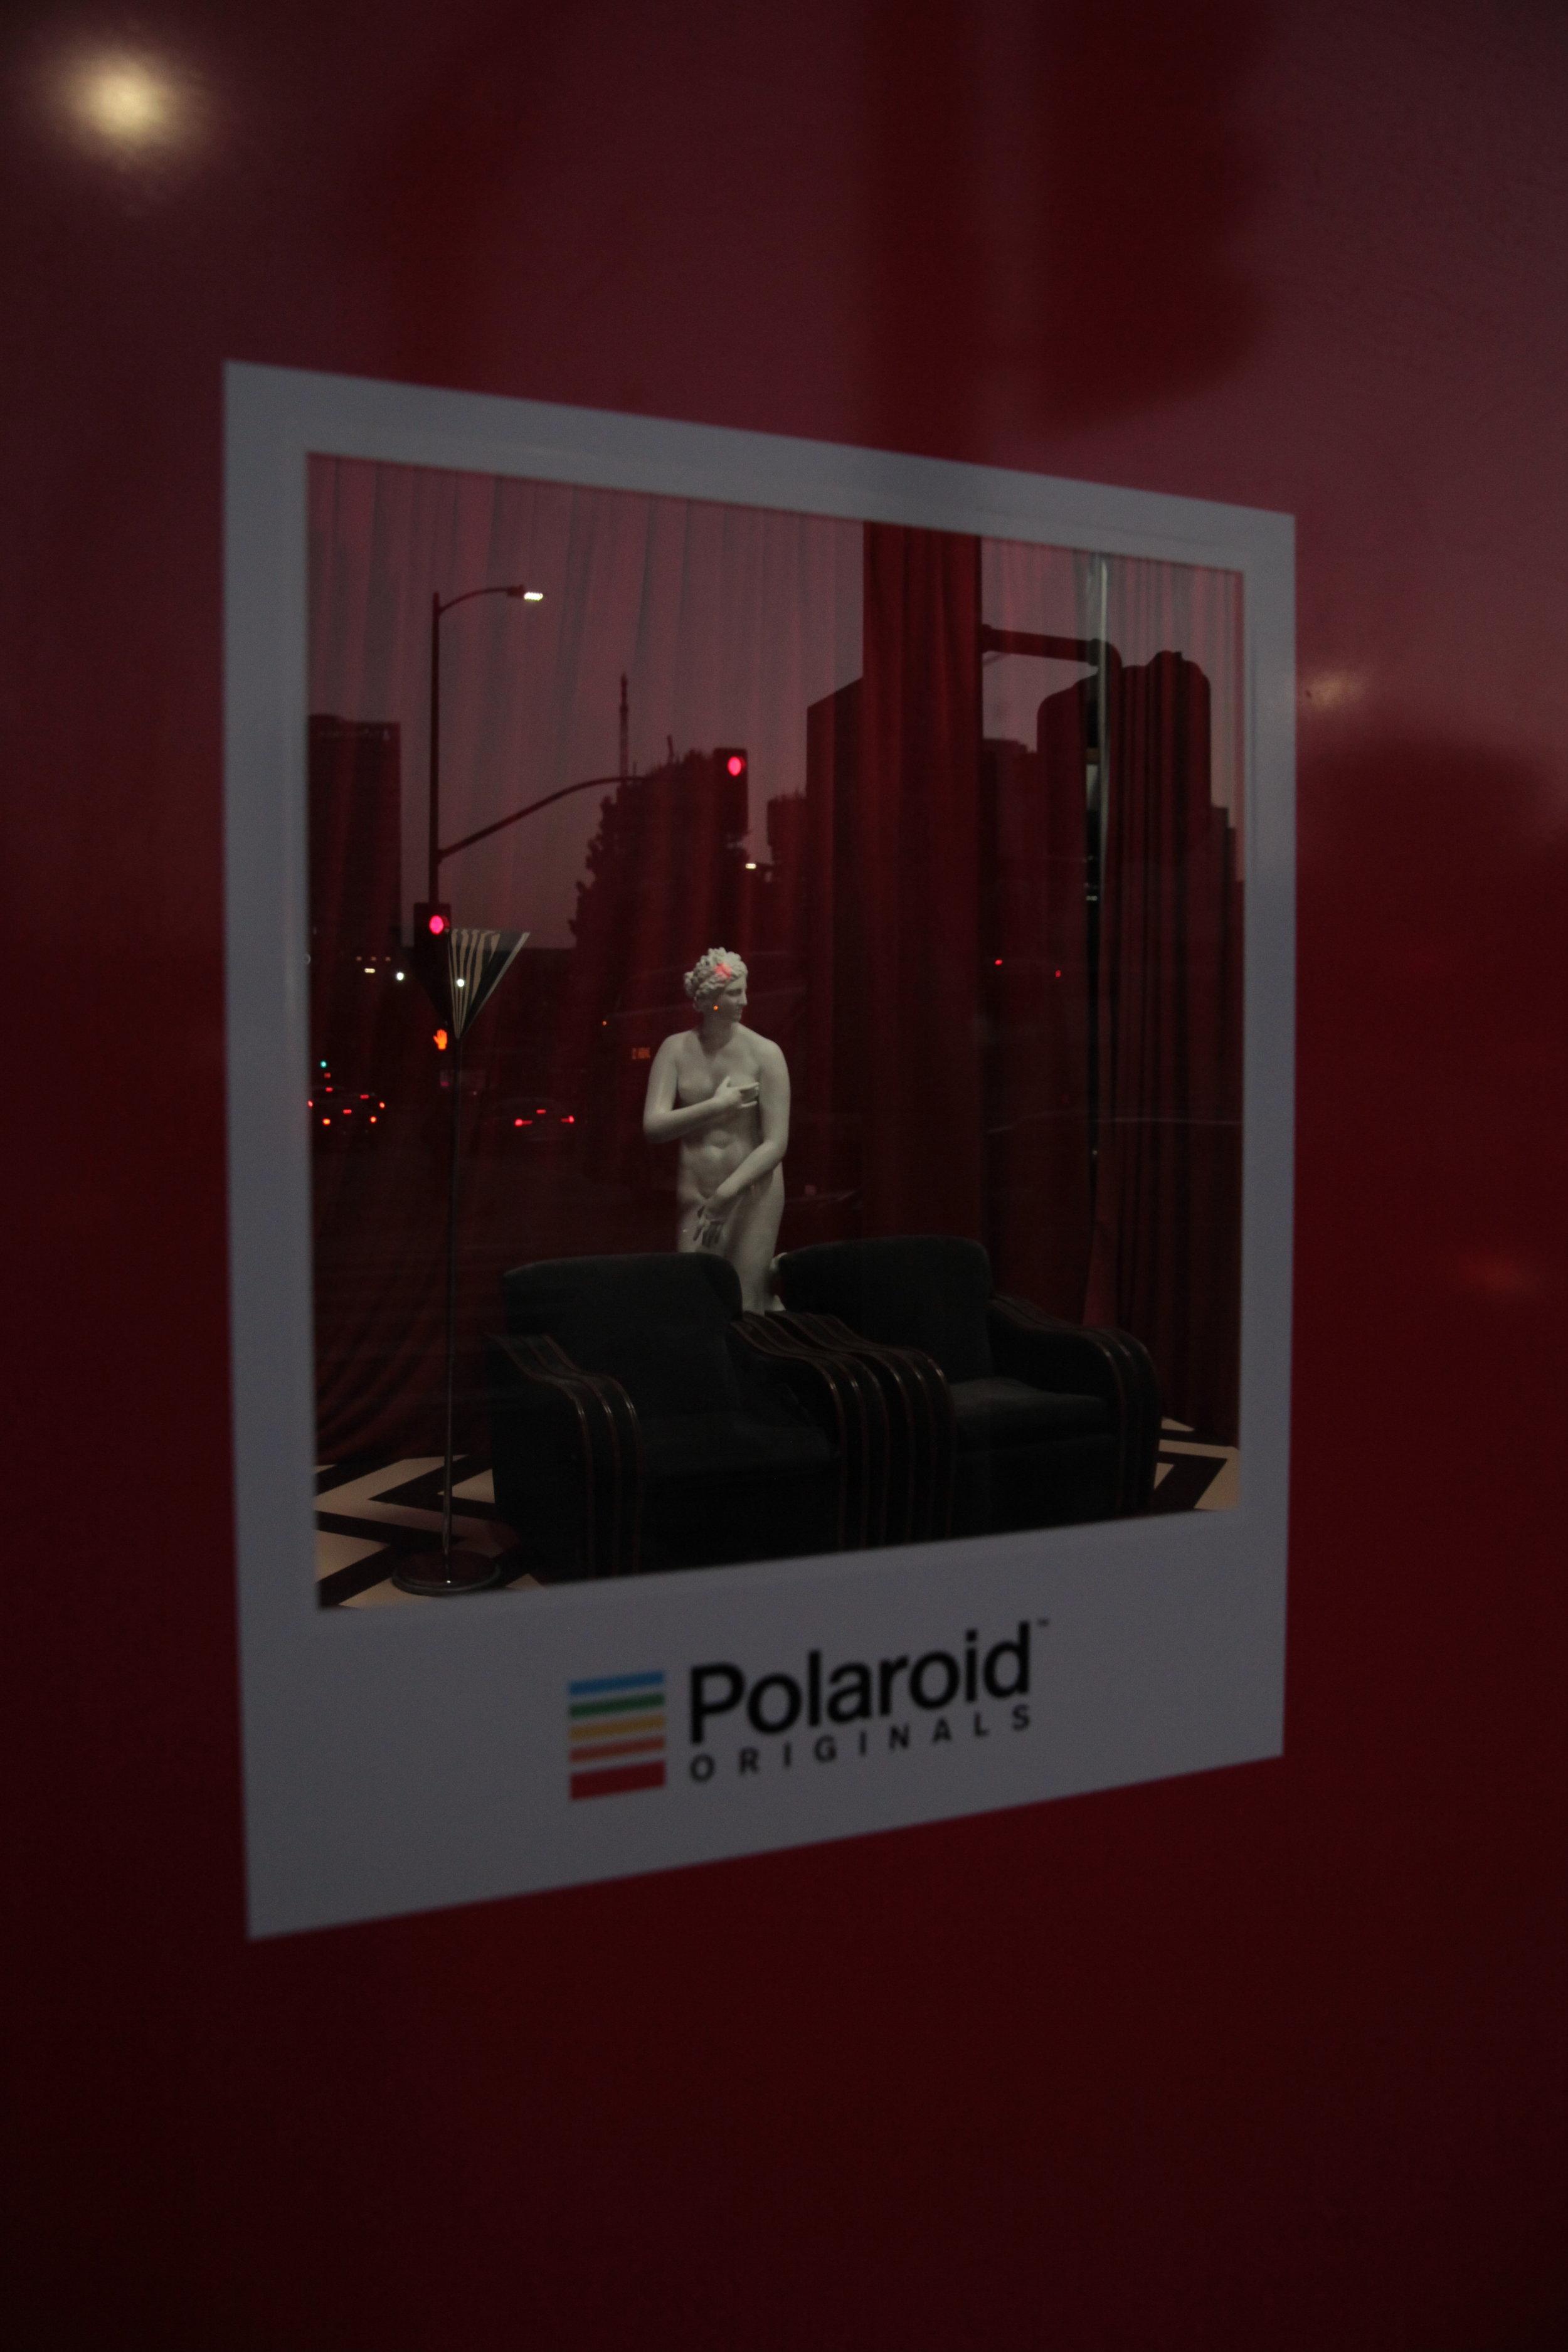 Polaroid_RedRoom_TwinPeaks_NathalyCharria_DavidLynch_FestivalofDisruption_LA_001.JPG